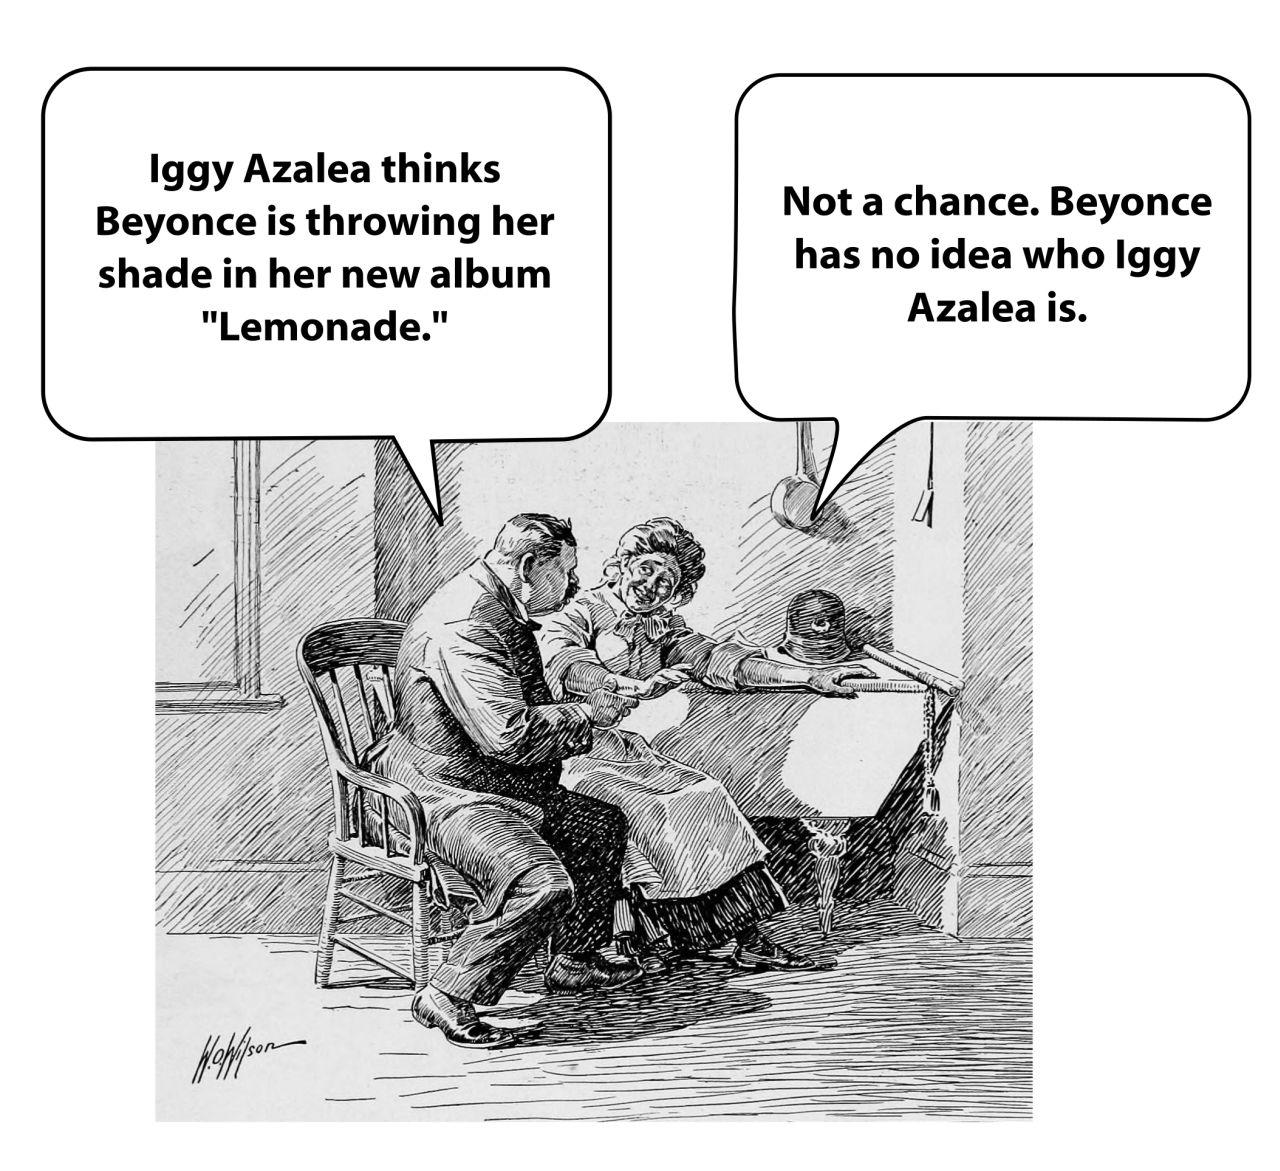 iggy azalea thinks beyonce is throwing shade-1280w